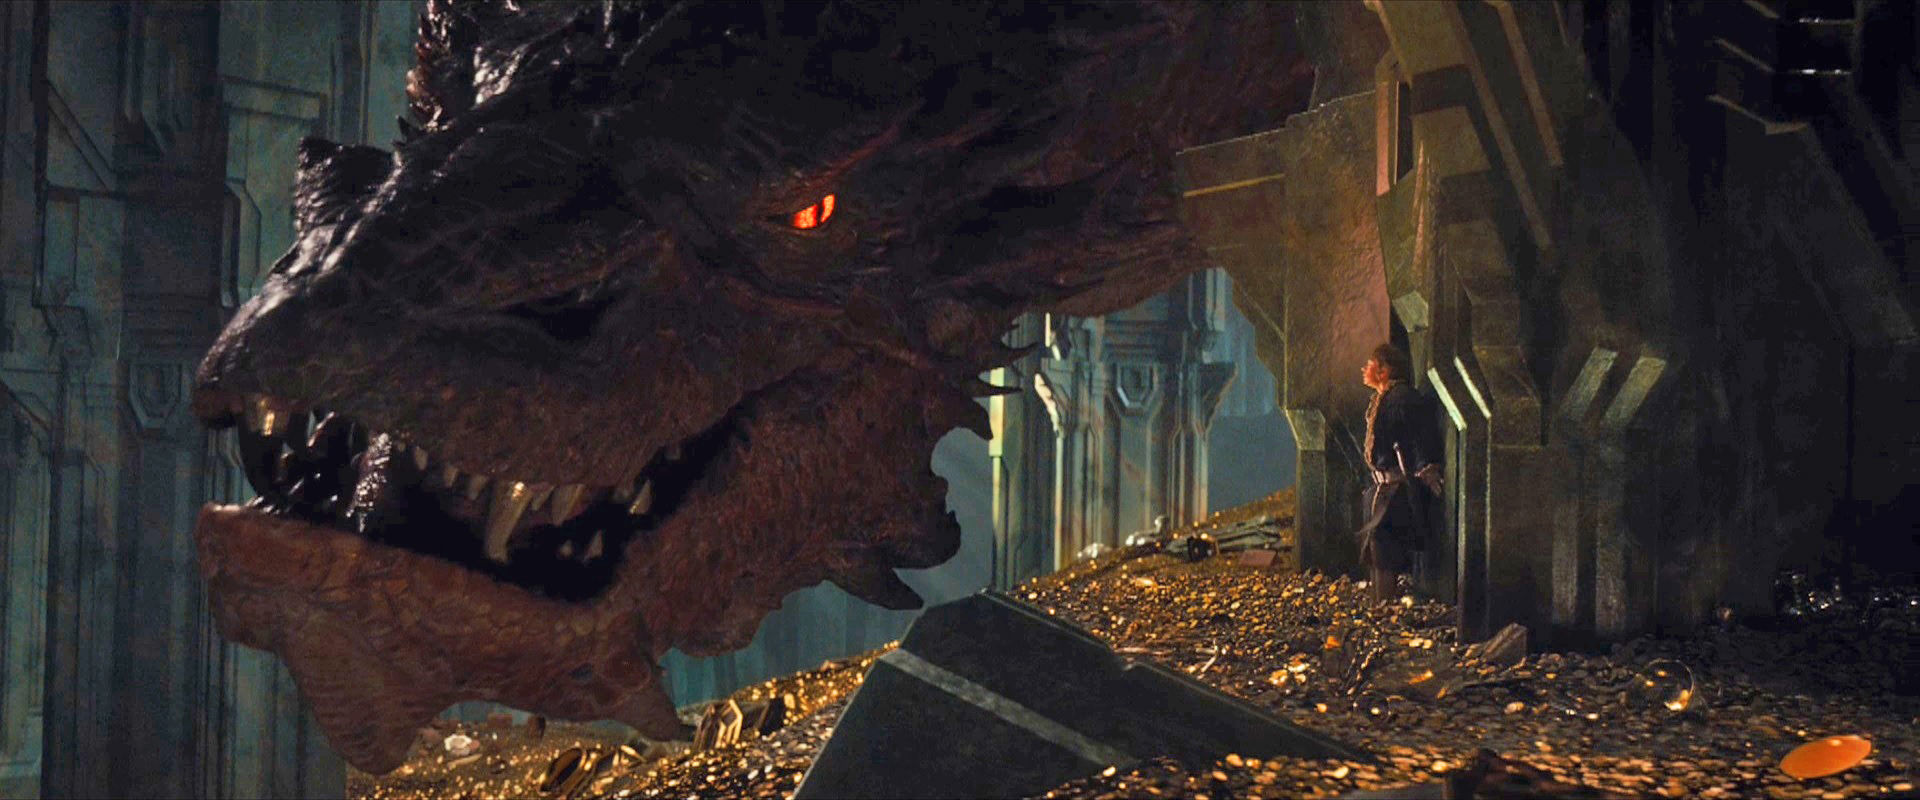 хоббит пустошь смауга дракон фото ace9701516b6